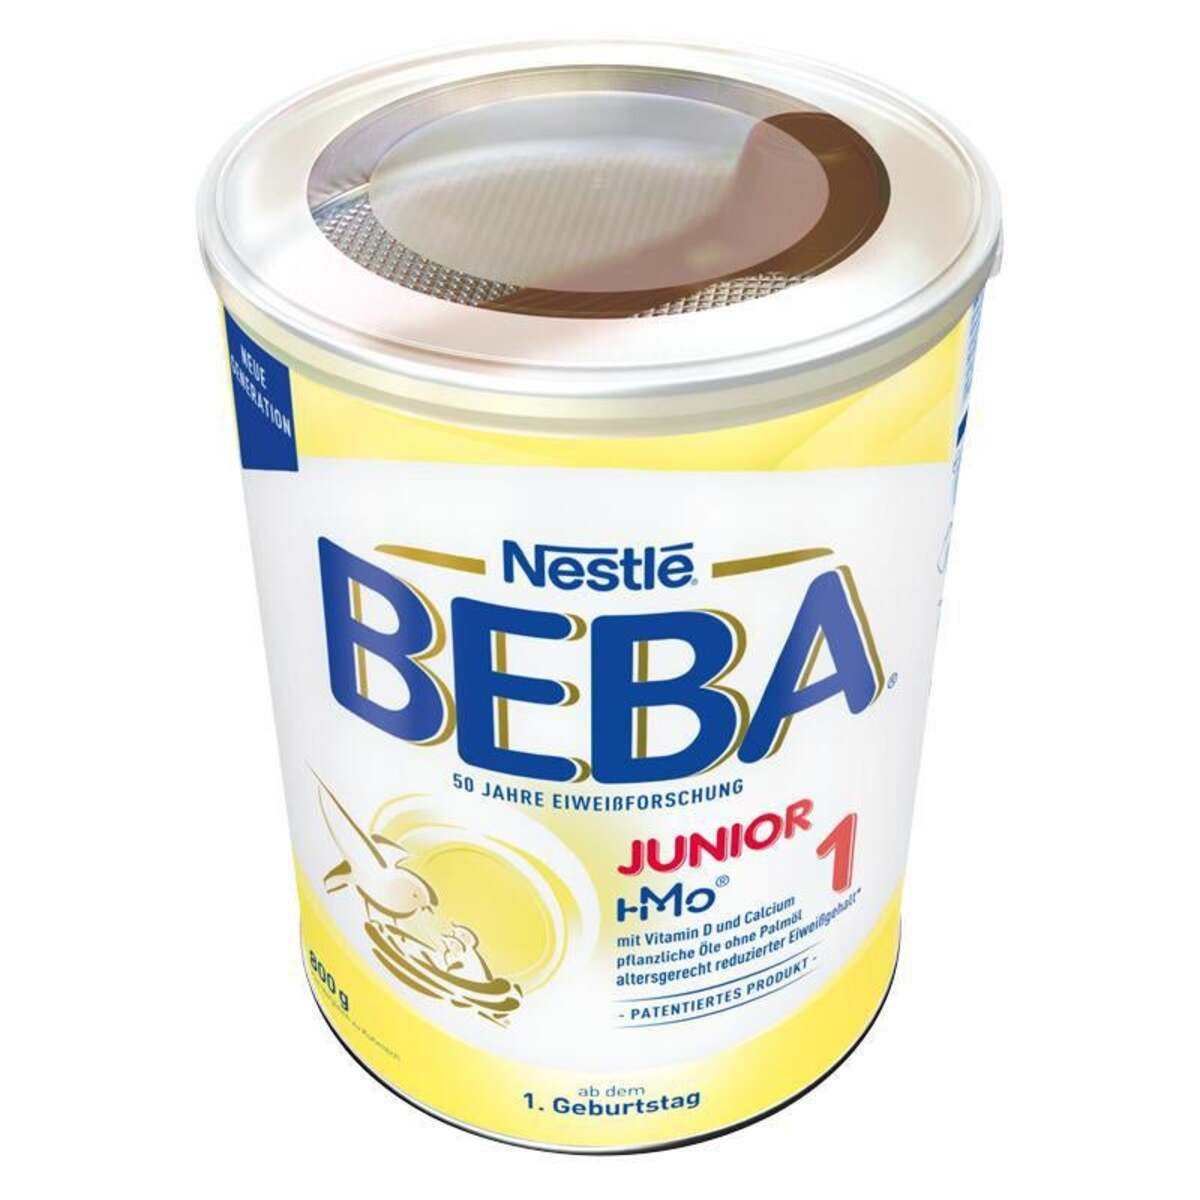 Bild 5 von BEBA Junior 1 ab dem 1. Geburtstag